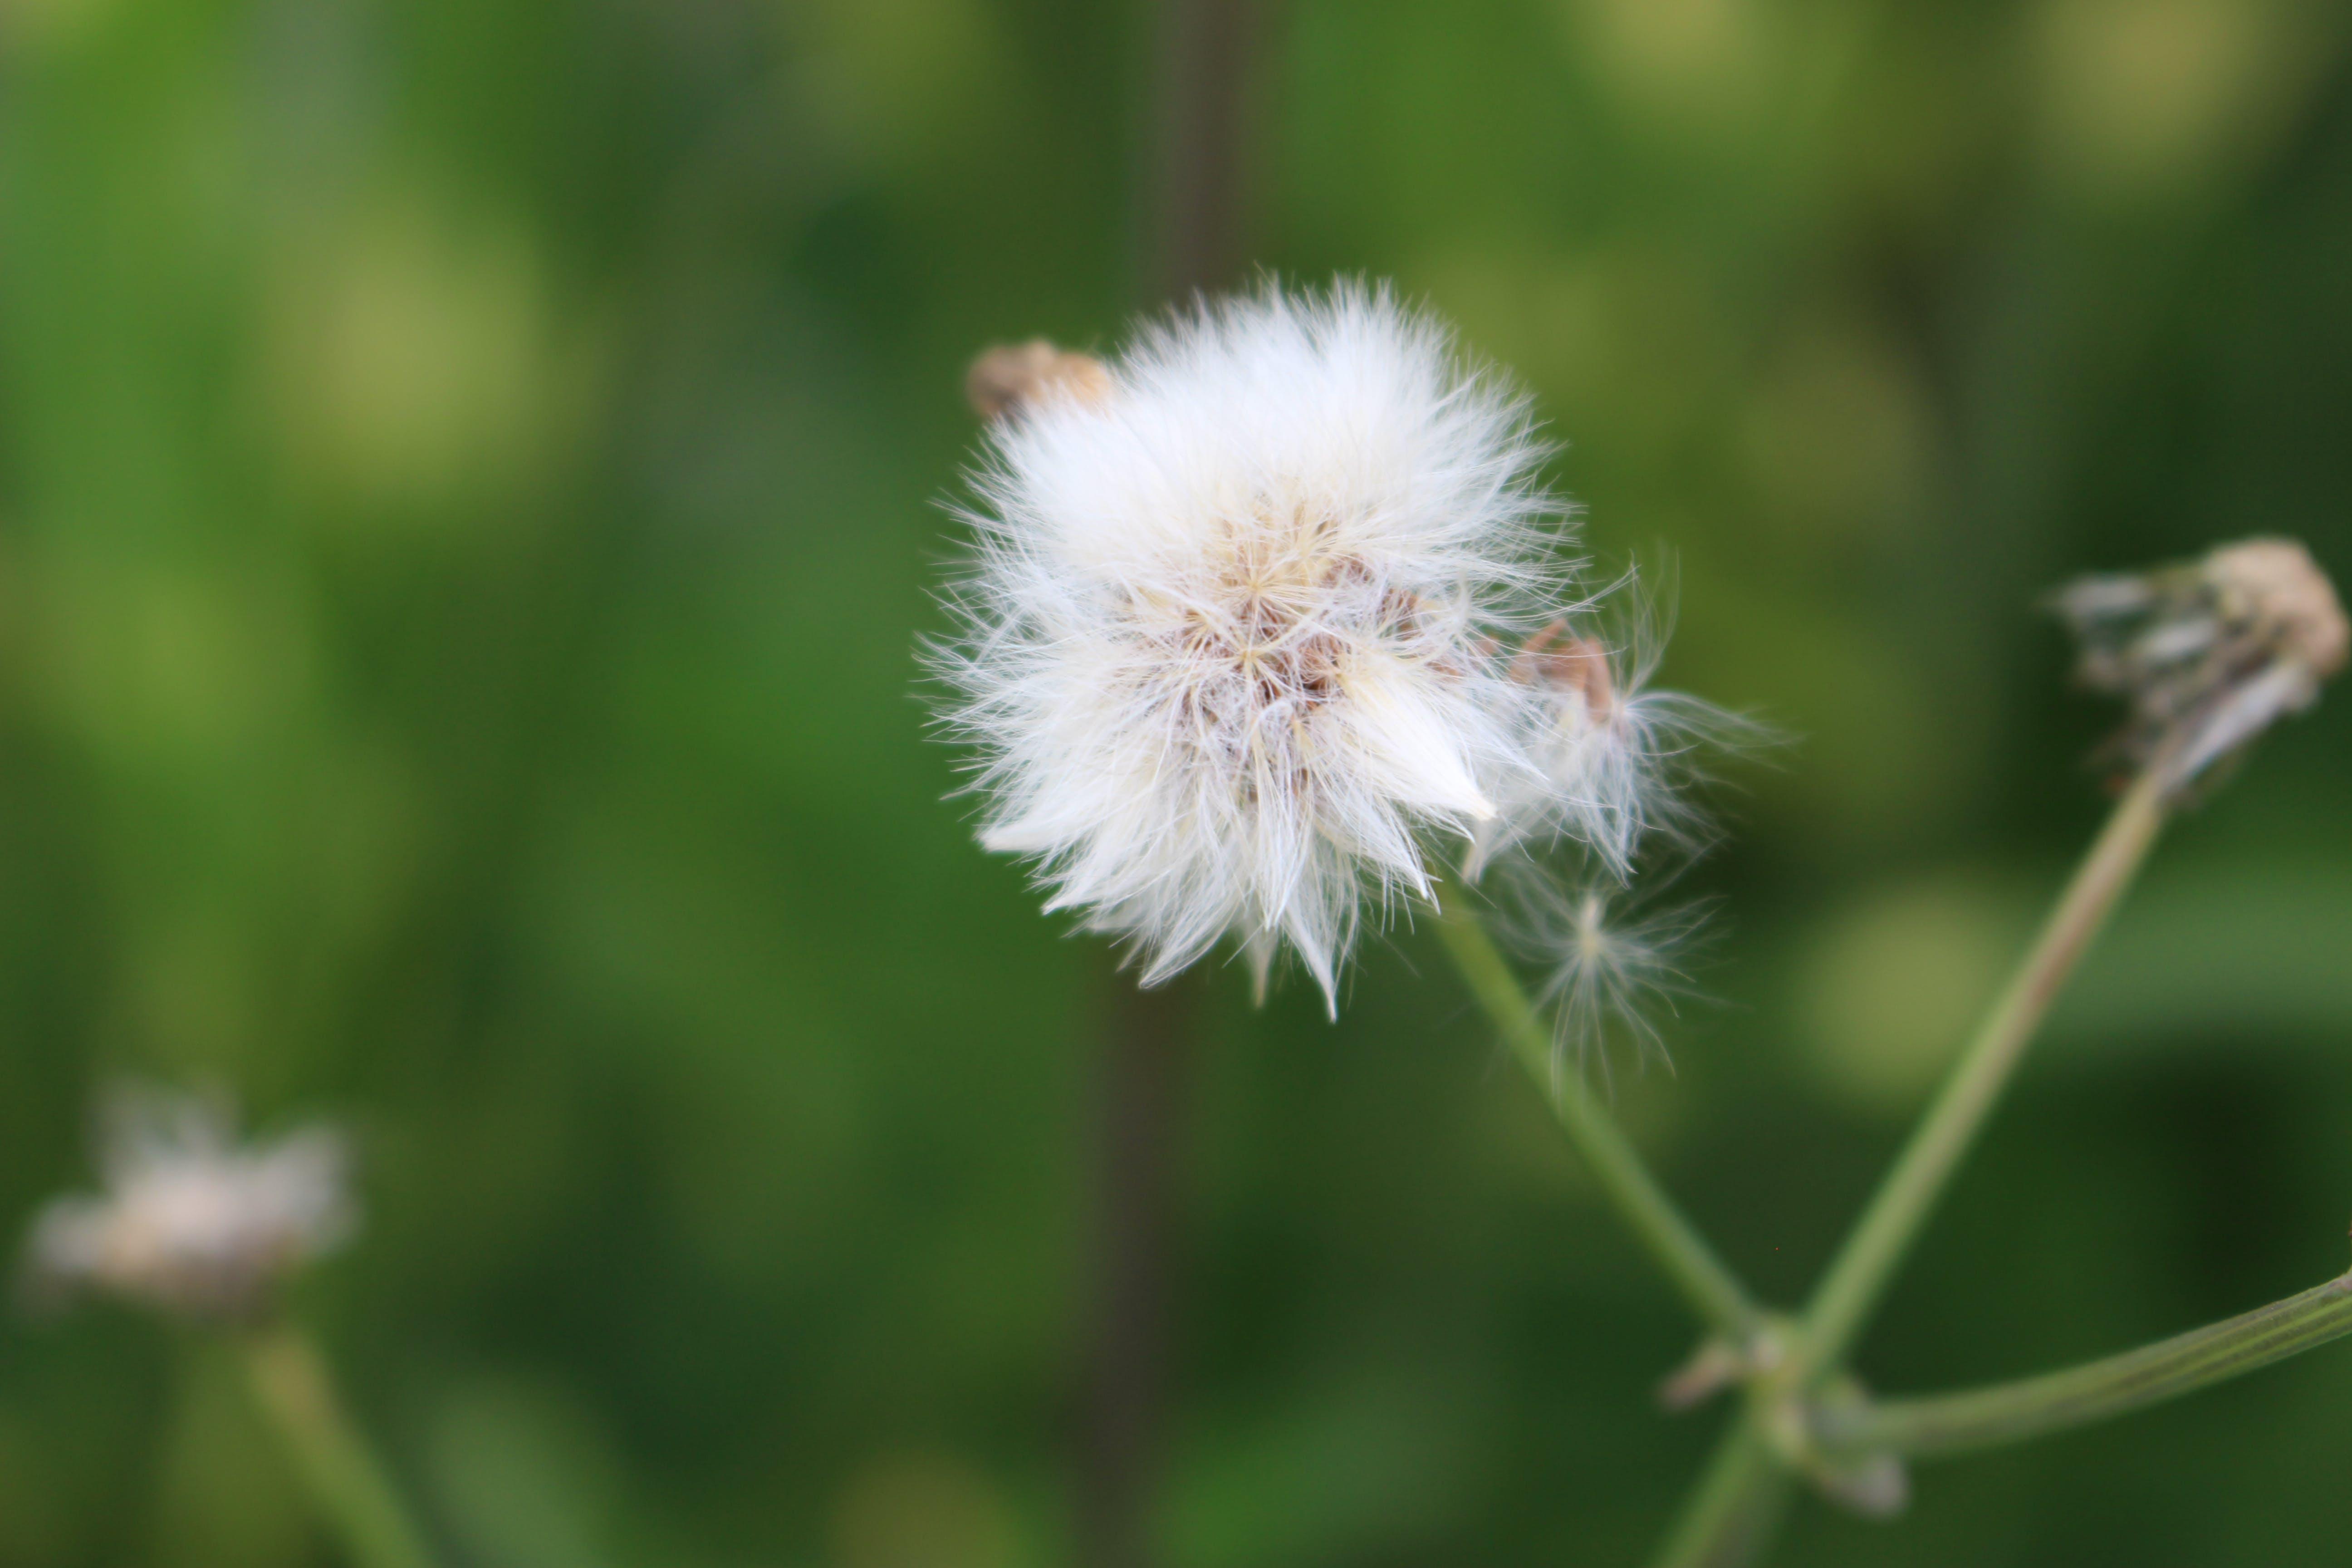 Free stock photo of nature, garden, blur, flower